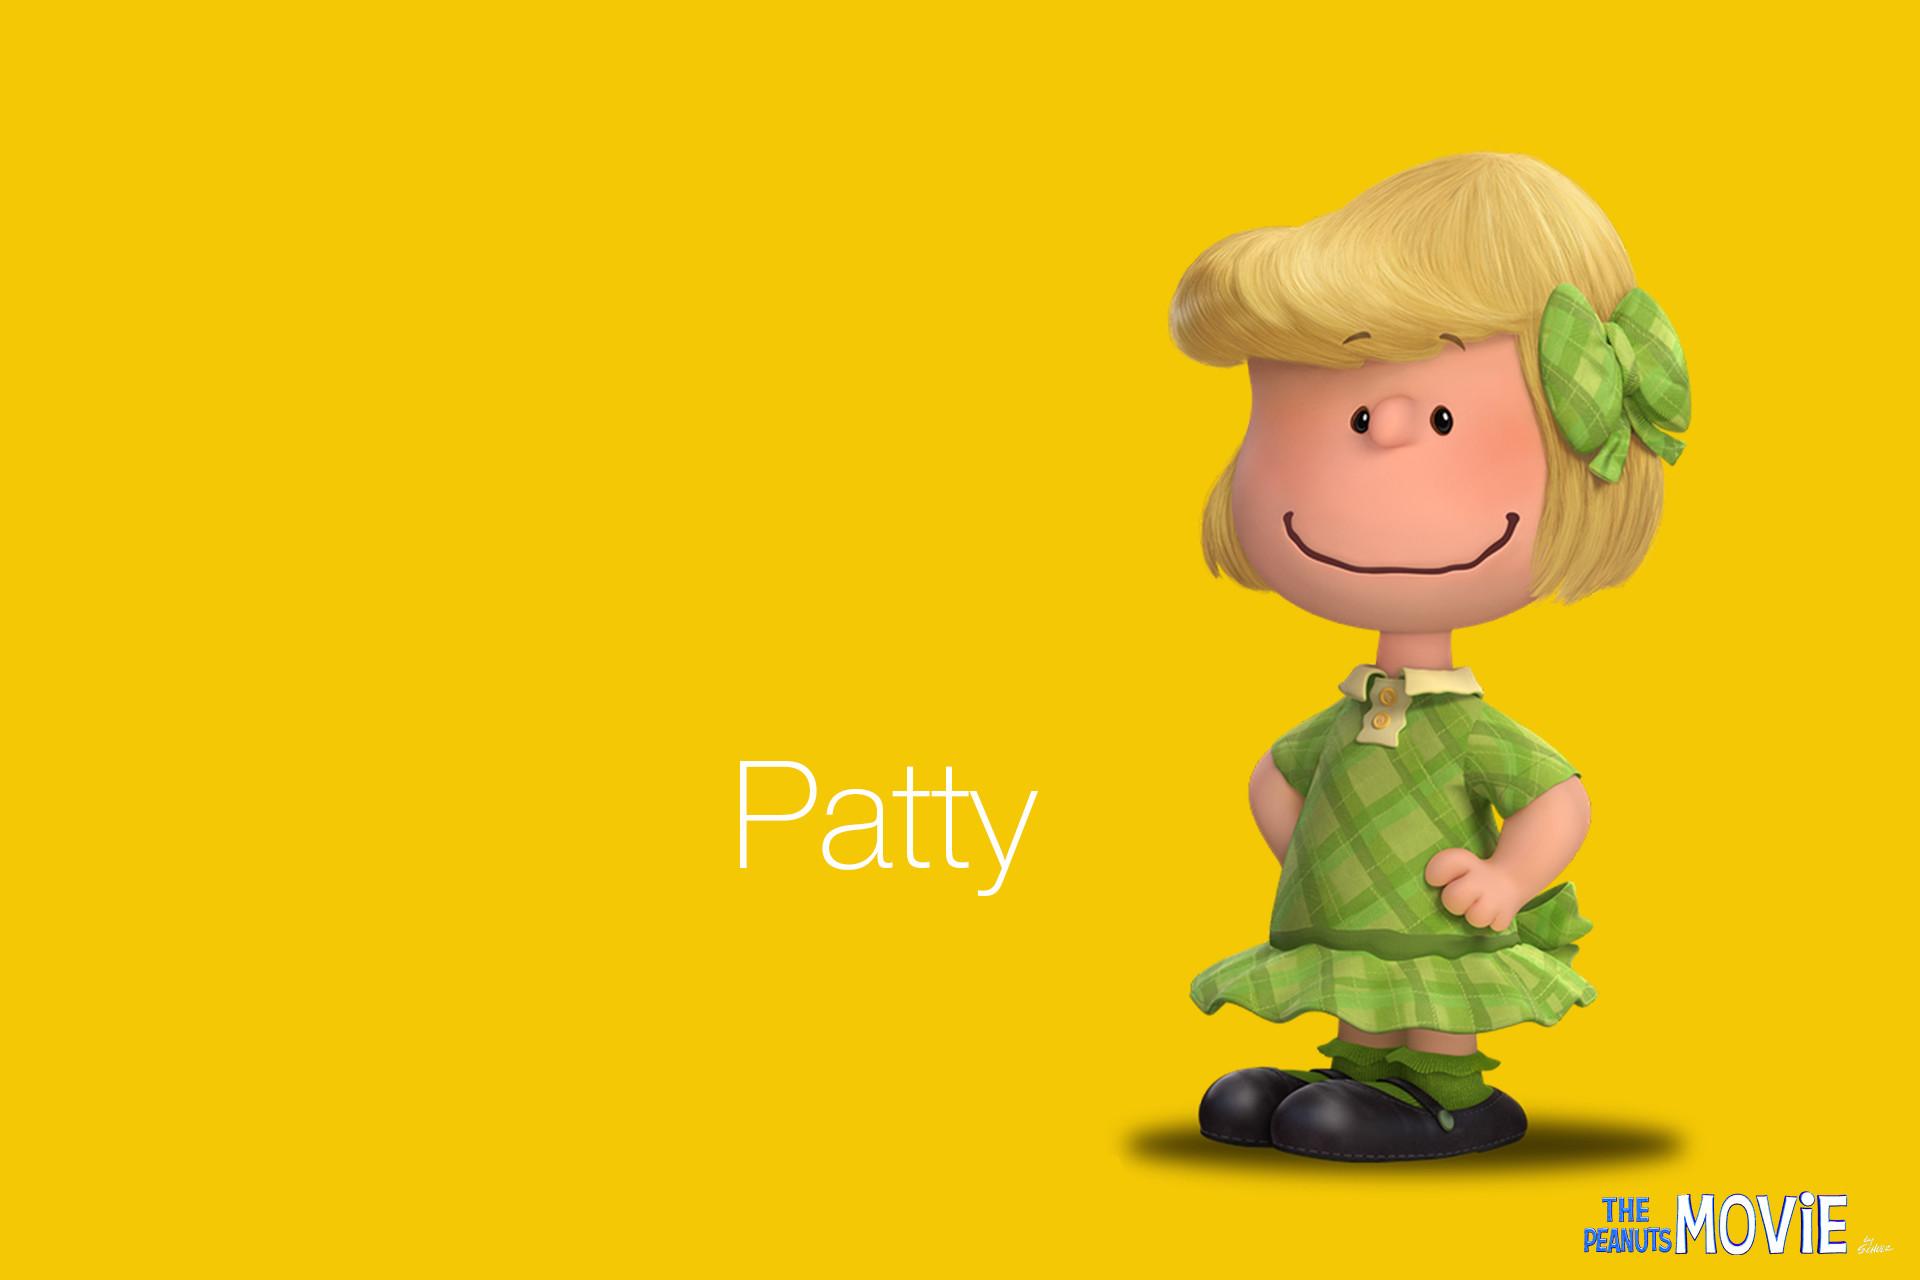 Little Peanut Girl Wallpaper Peanuts Characters Wallpaper 55 Images